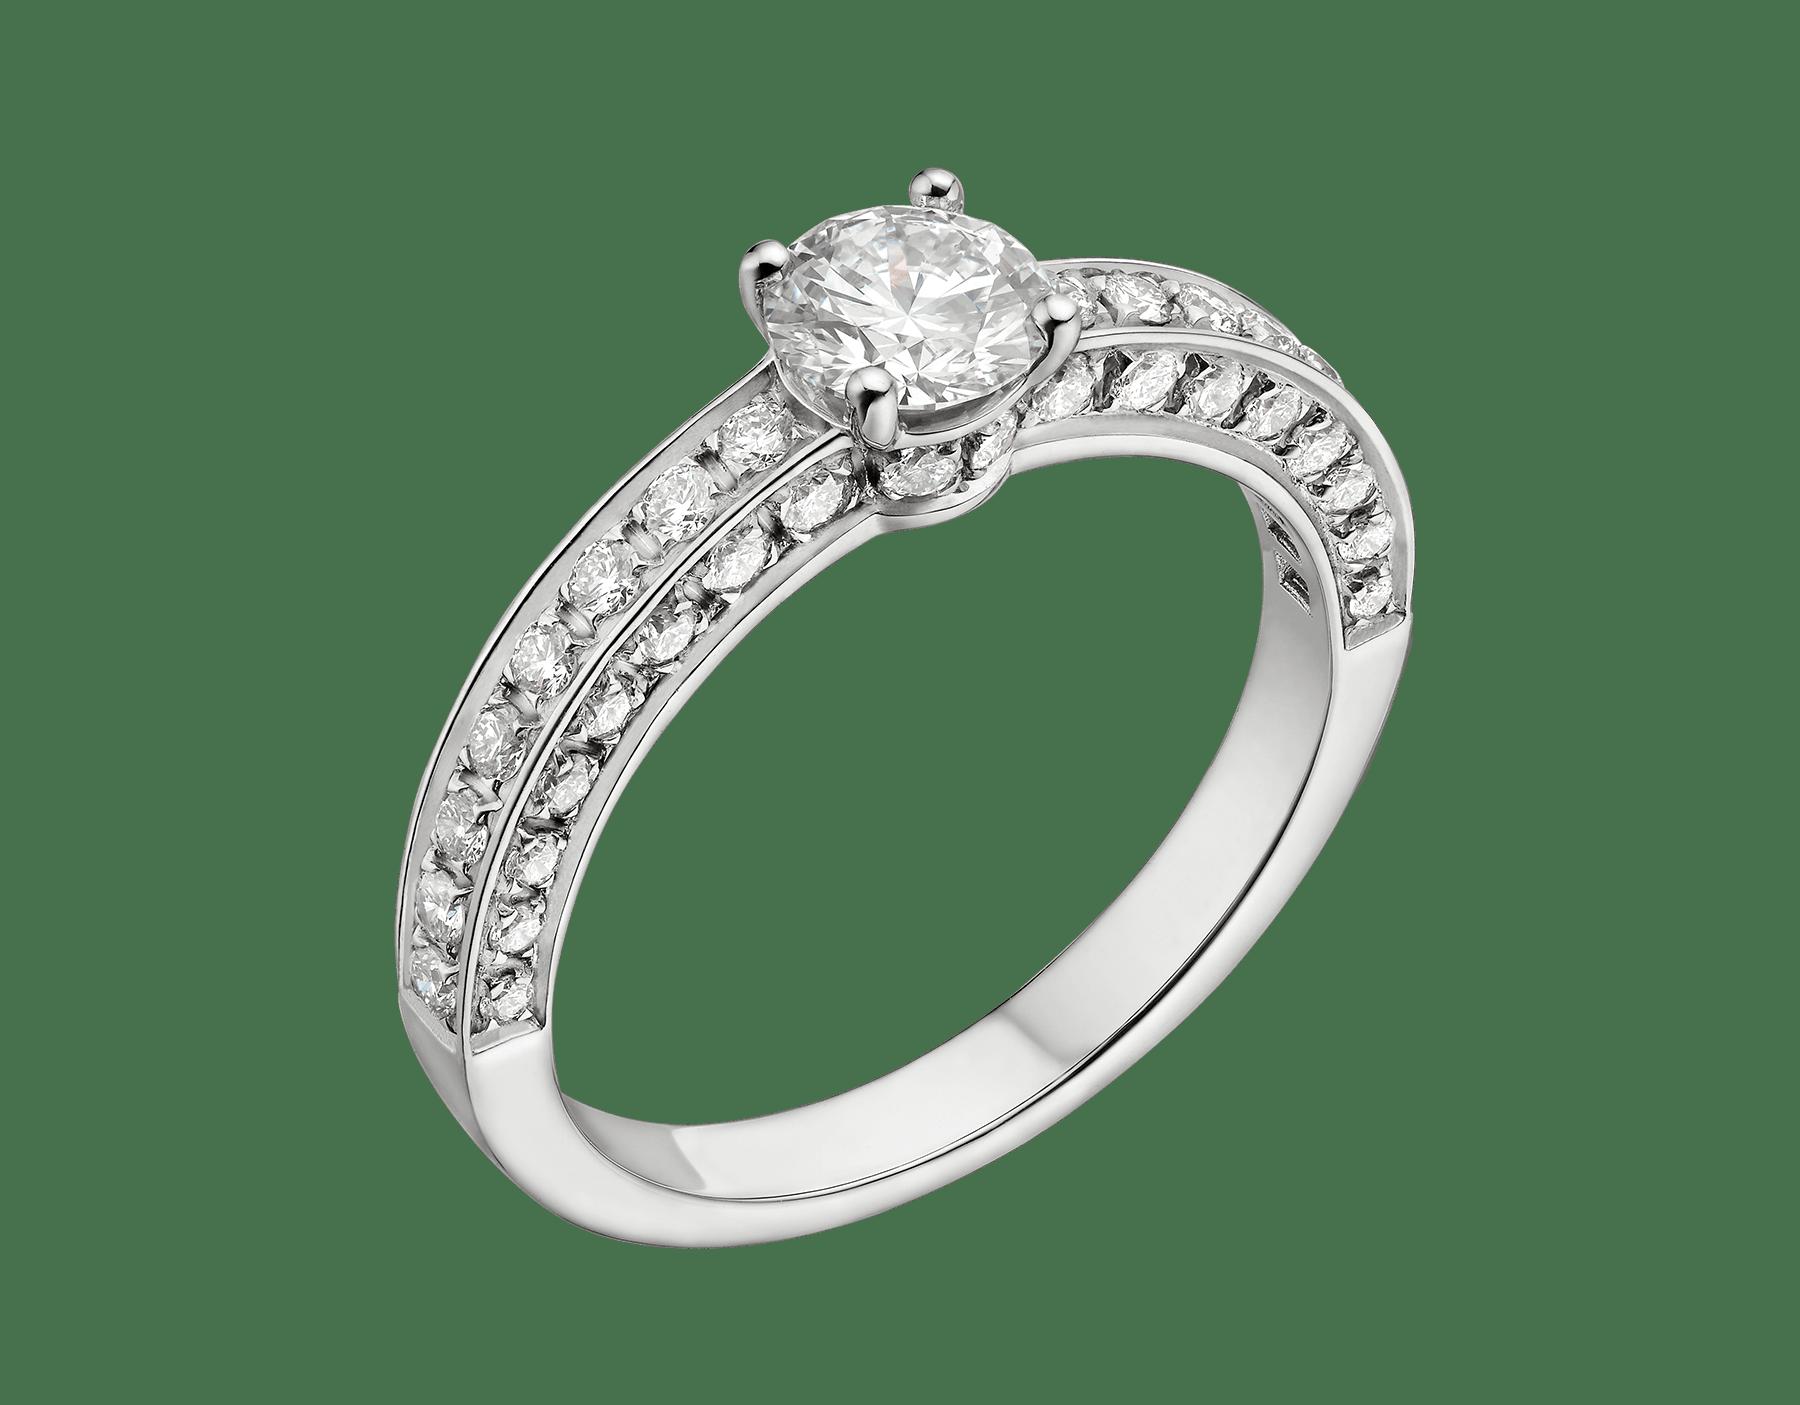 Dedicata a Venezia: 1503 鉑金單顆美鑽戒指,鑲飾圓形明亮型切割鑽石和密鑲鑽石。鑽石重量 0.30 克拉起。定情戒在歷史上最早見於西元 1503 年,這款戒指就是以此命名。 348444 image 1